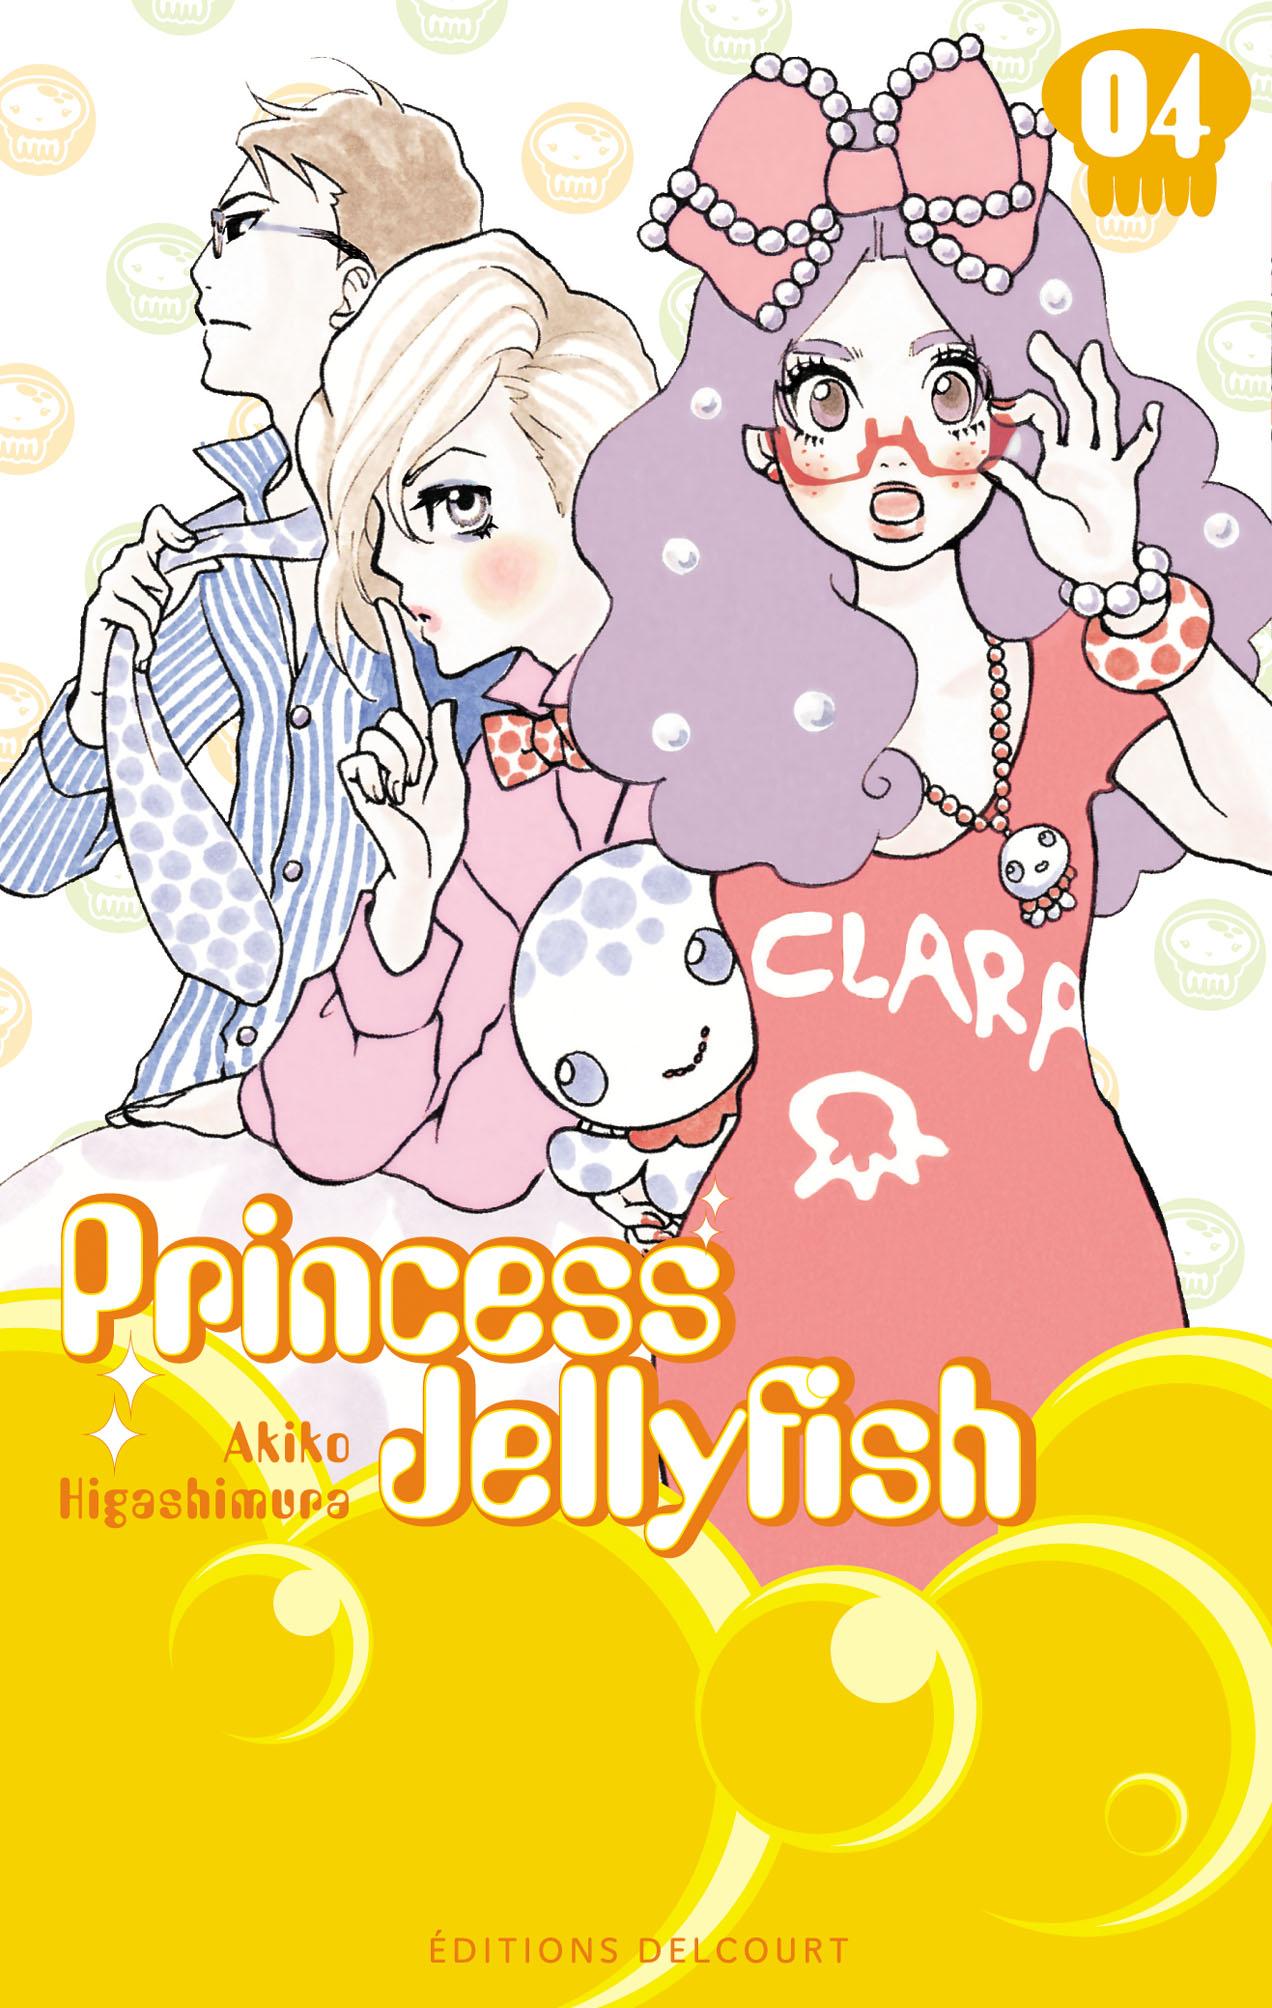 http://img.manga-sanctuary.com/big/princess-jellyfish-manga-volume-4-simple-53460.jpg